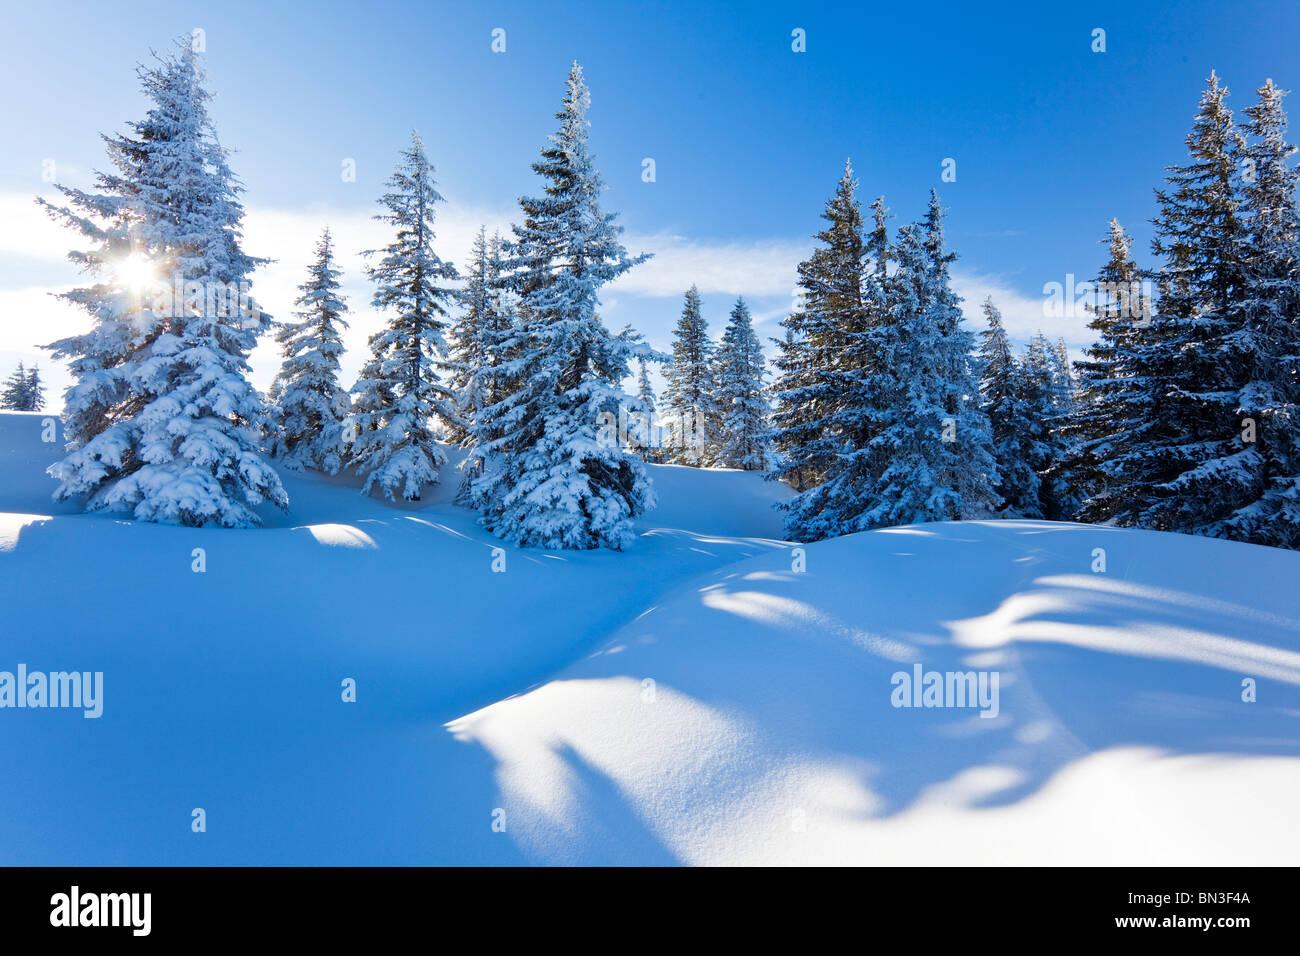 Snow-covered spruce trees, Berchtesgaden Alps, Muehlbach, Austria - Stock Image